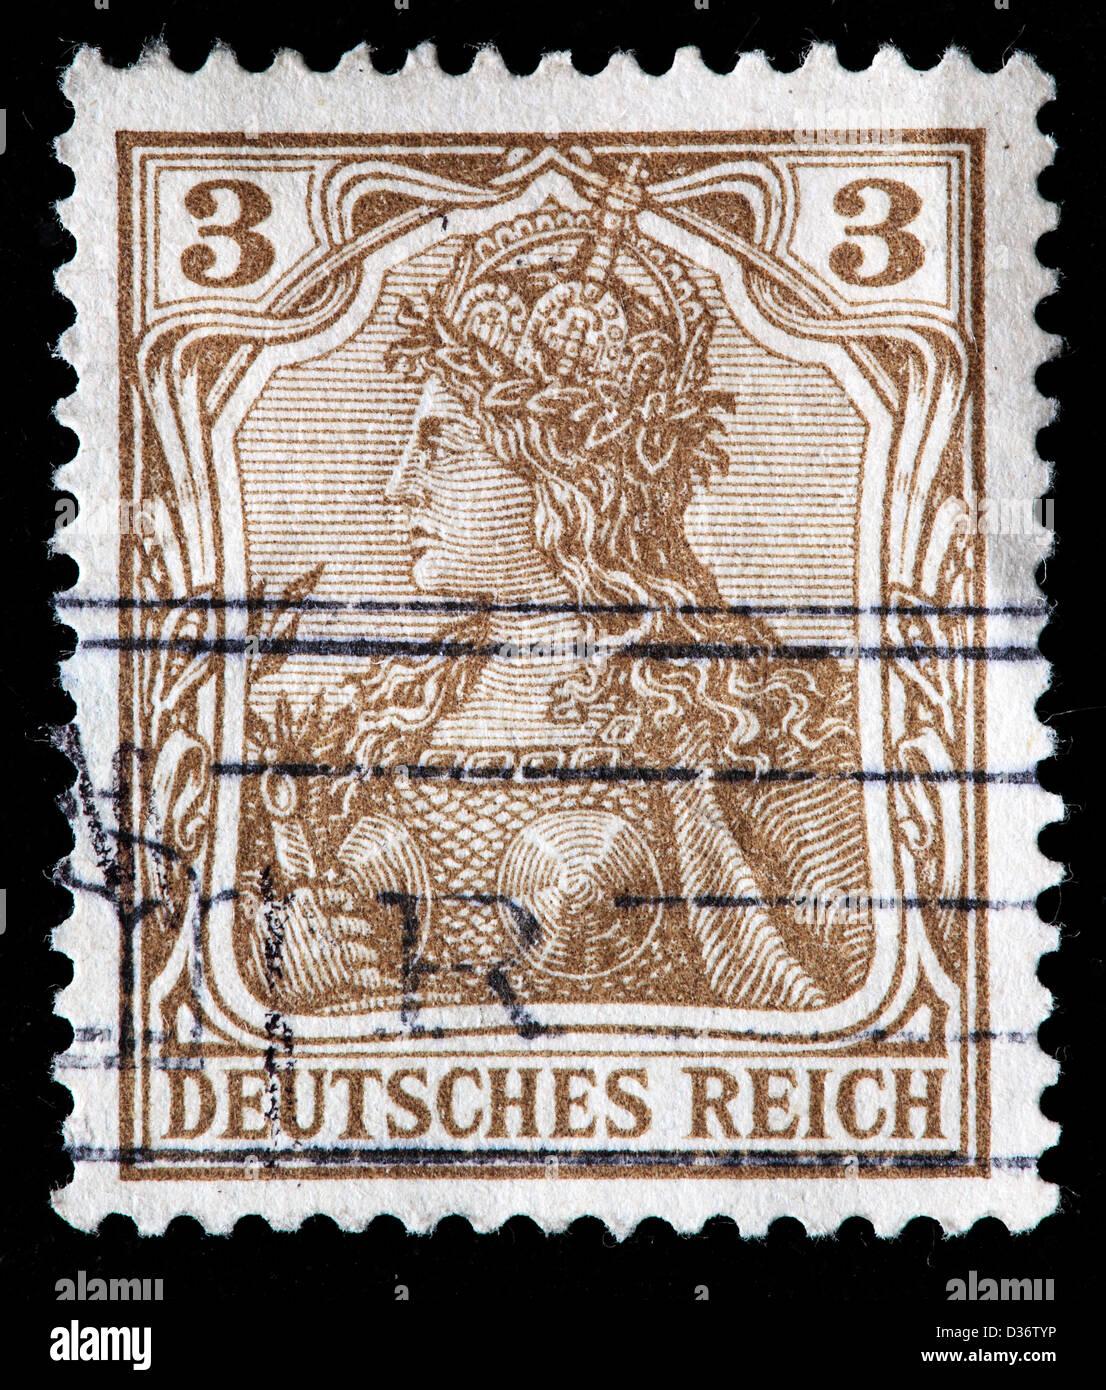 Germania, francobollo, Germania, 1902 Immagini Stock